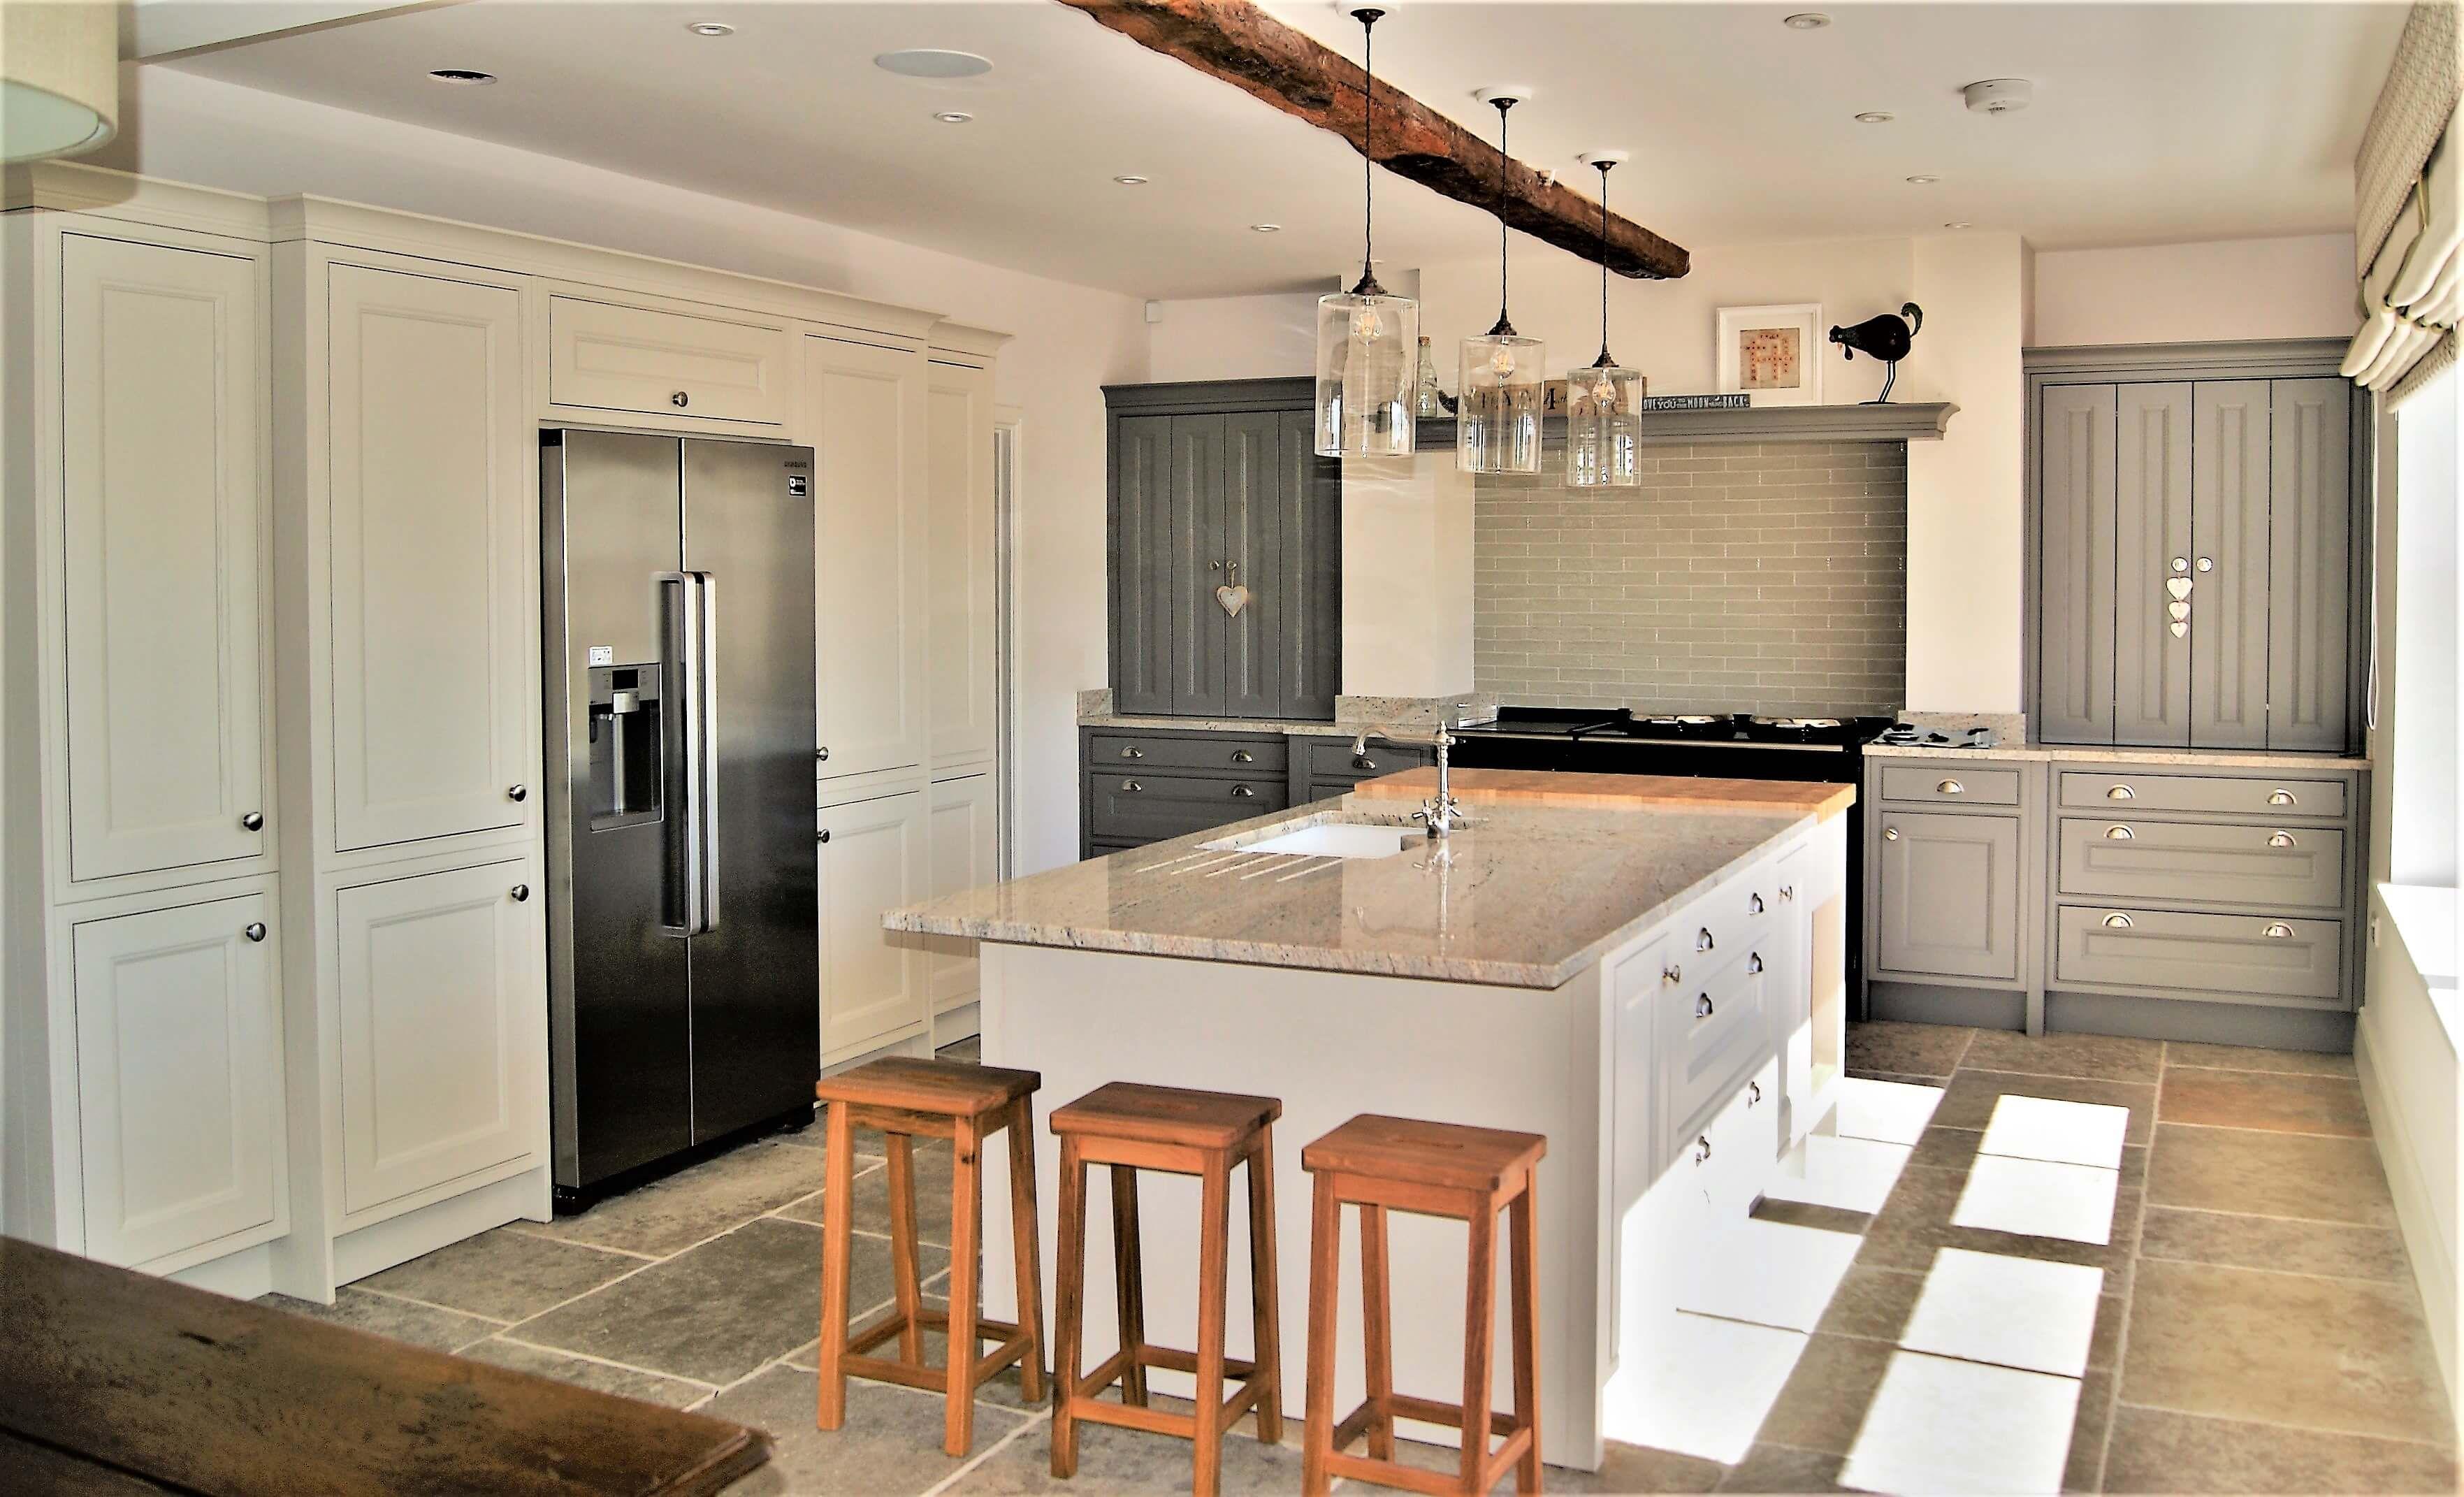 Broughton Astley - Noble Kitchens